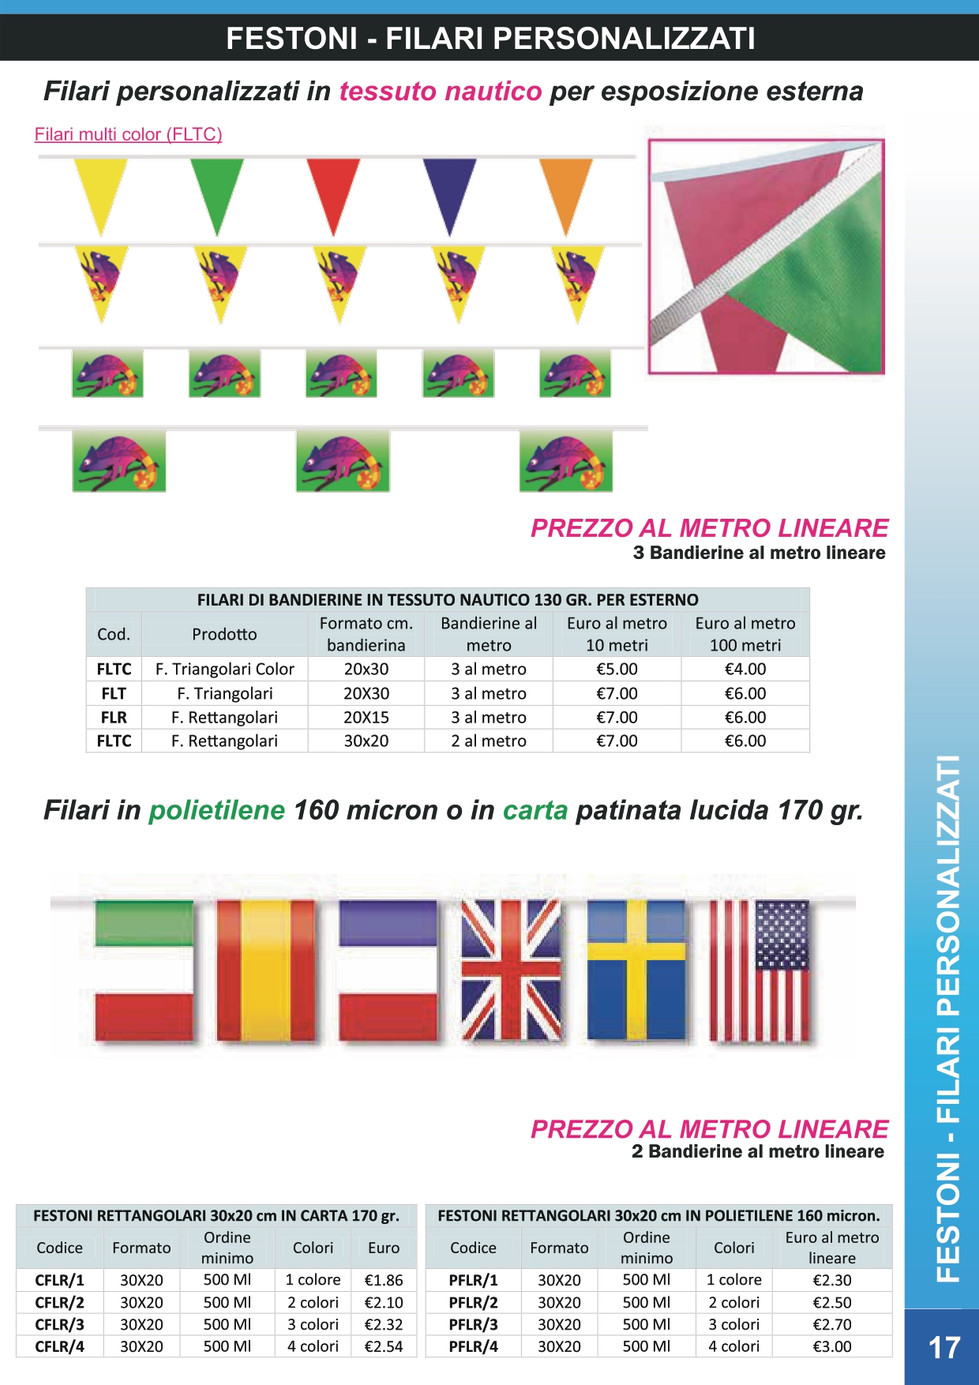 flagBandiere_page-0019.jpg